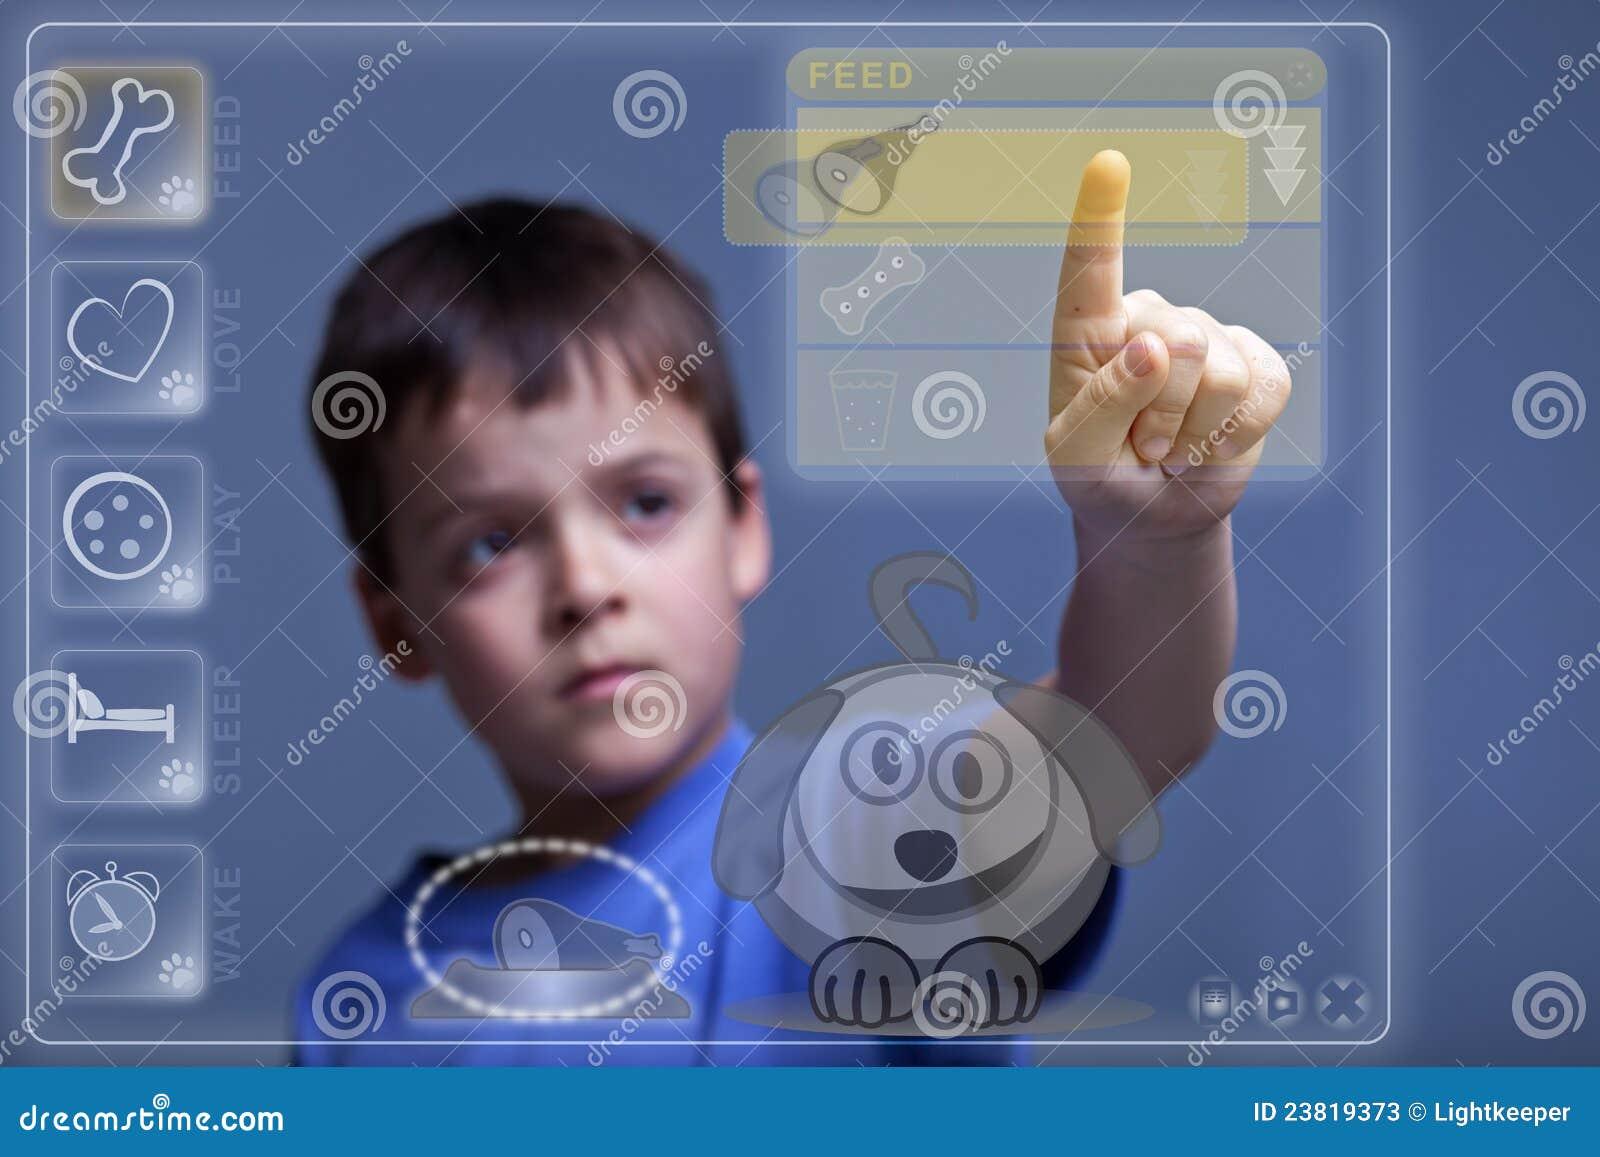 Modern Child Feeding Virtual Pet Displayed Touchscreen Like Device